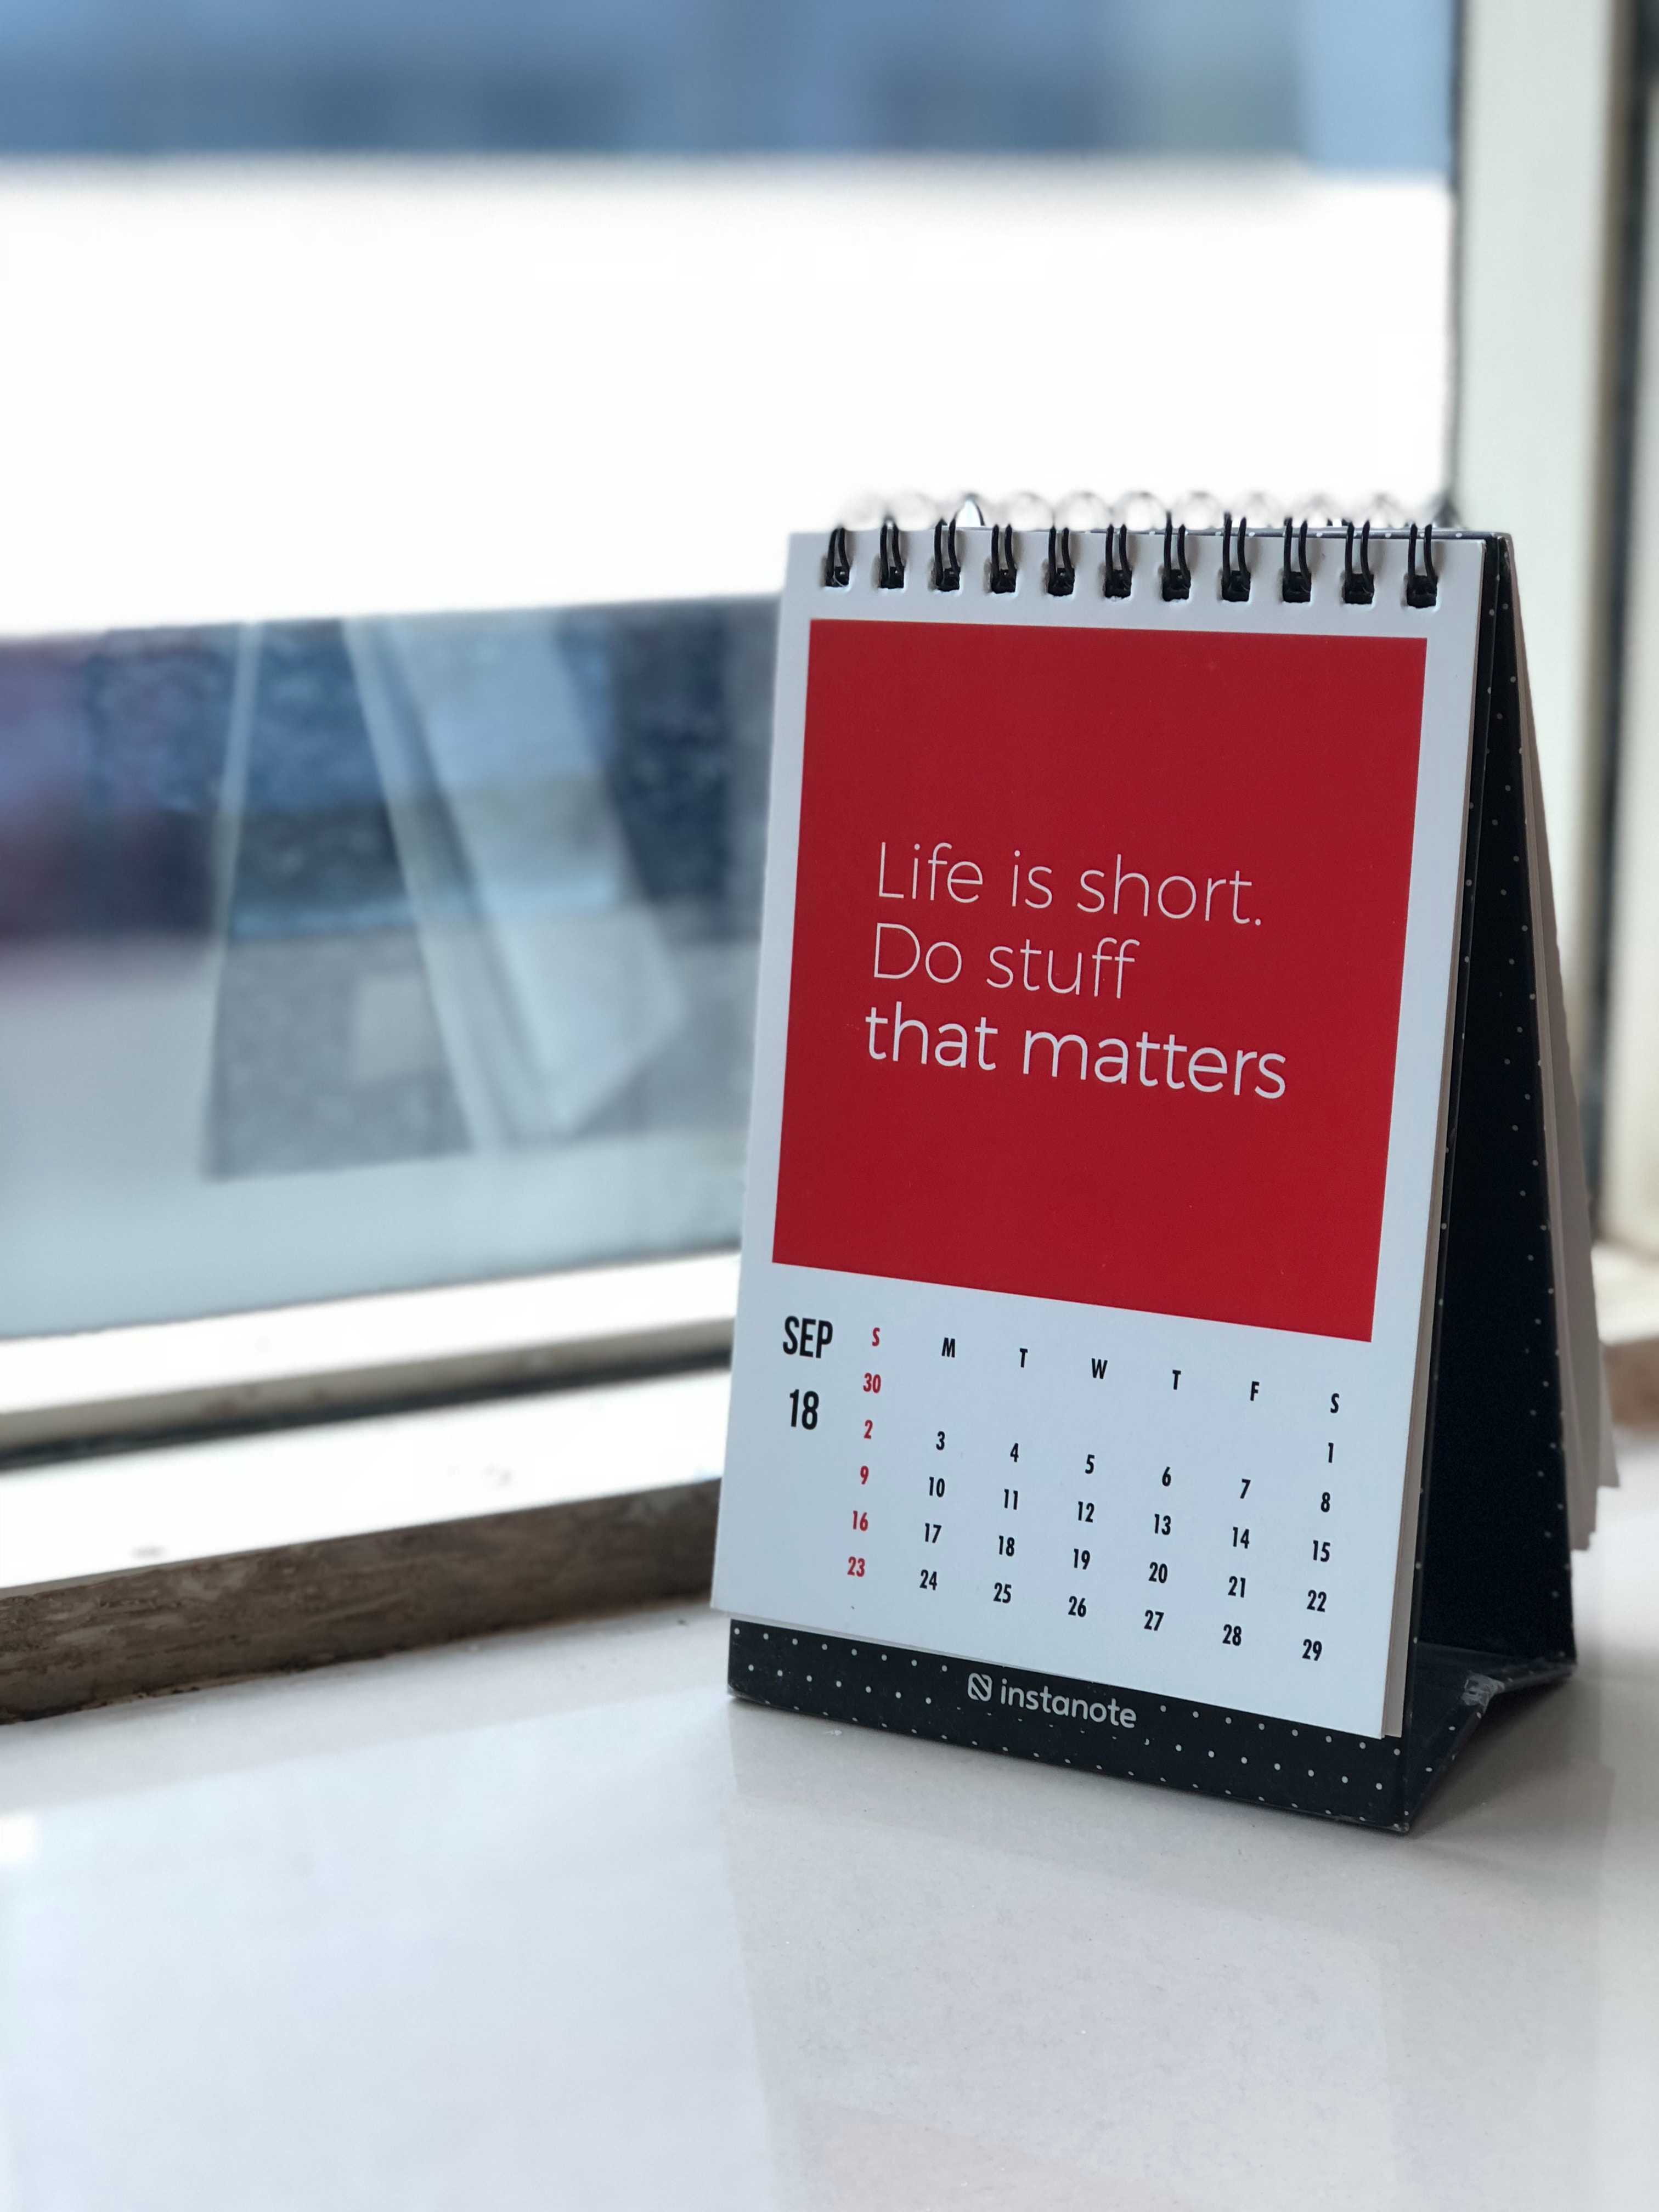 manasvita-s-844576-unsplash_life is short do stuff that matters_encouragement